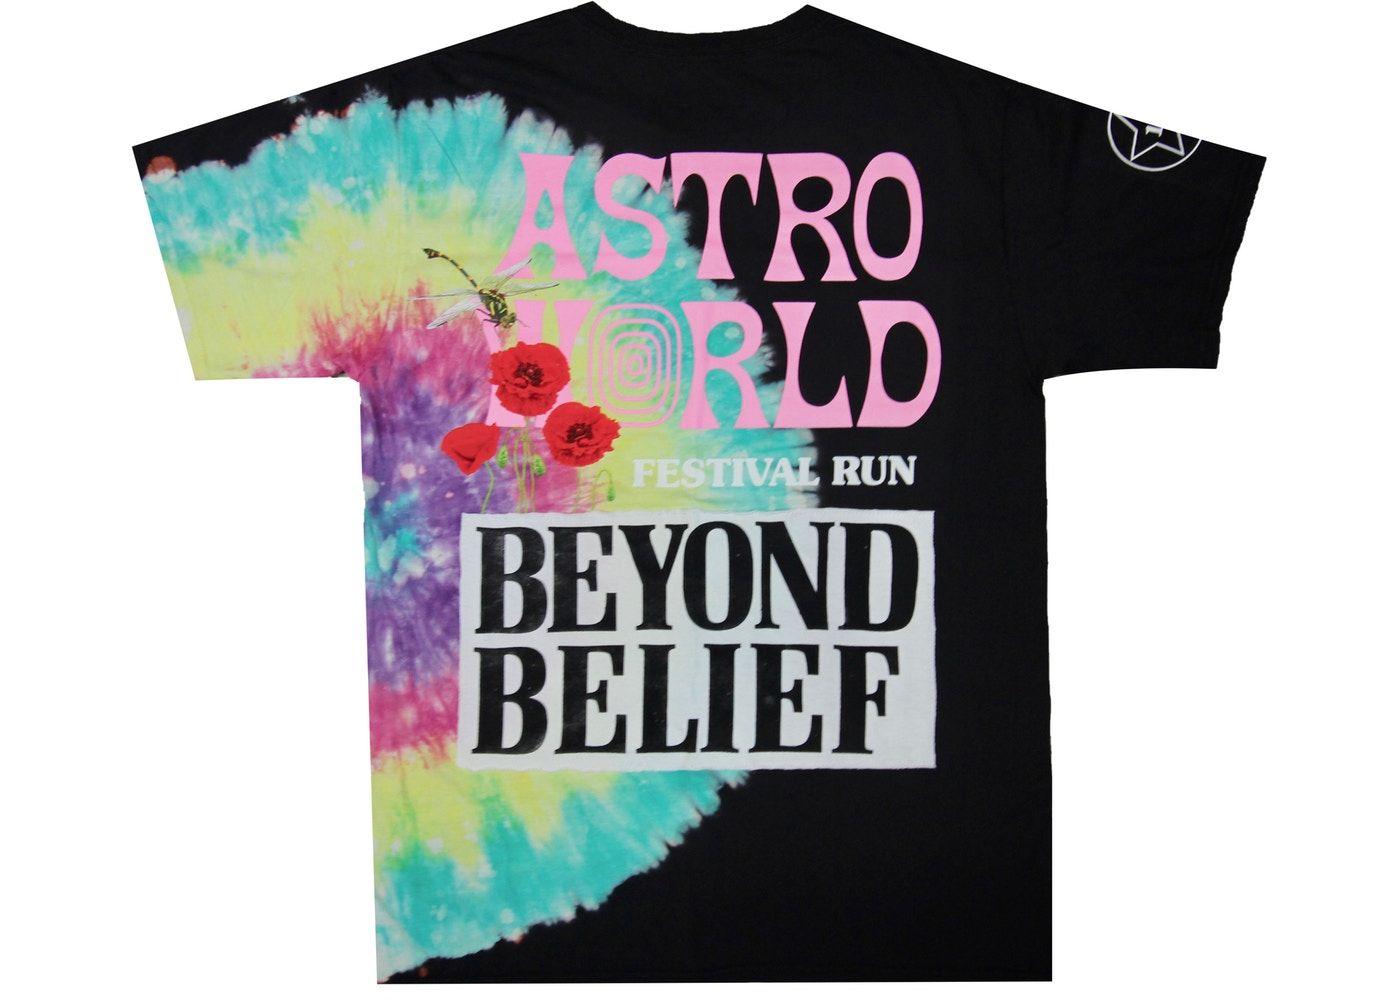 Travis Scott Astroworld Festival Run Tie Dye Tee Black In 2020 Travis Scott Astroworld Black Tee Travis Scott Outfits